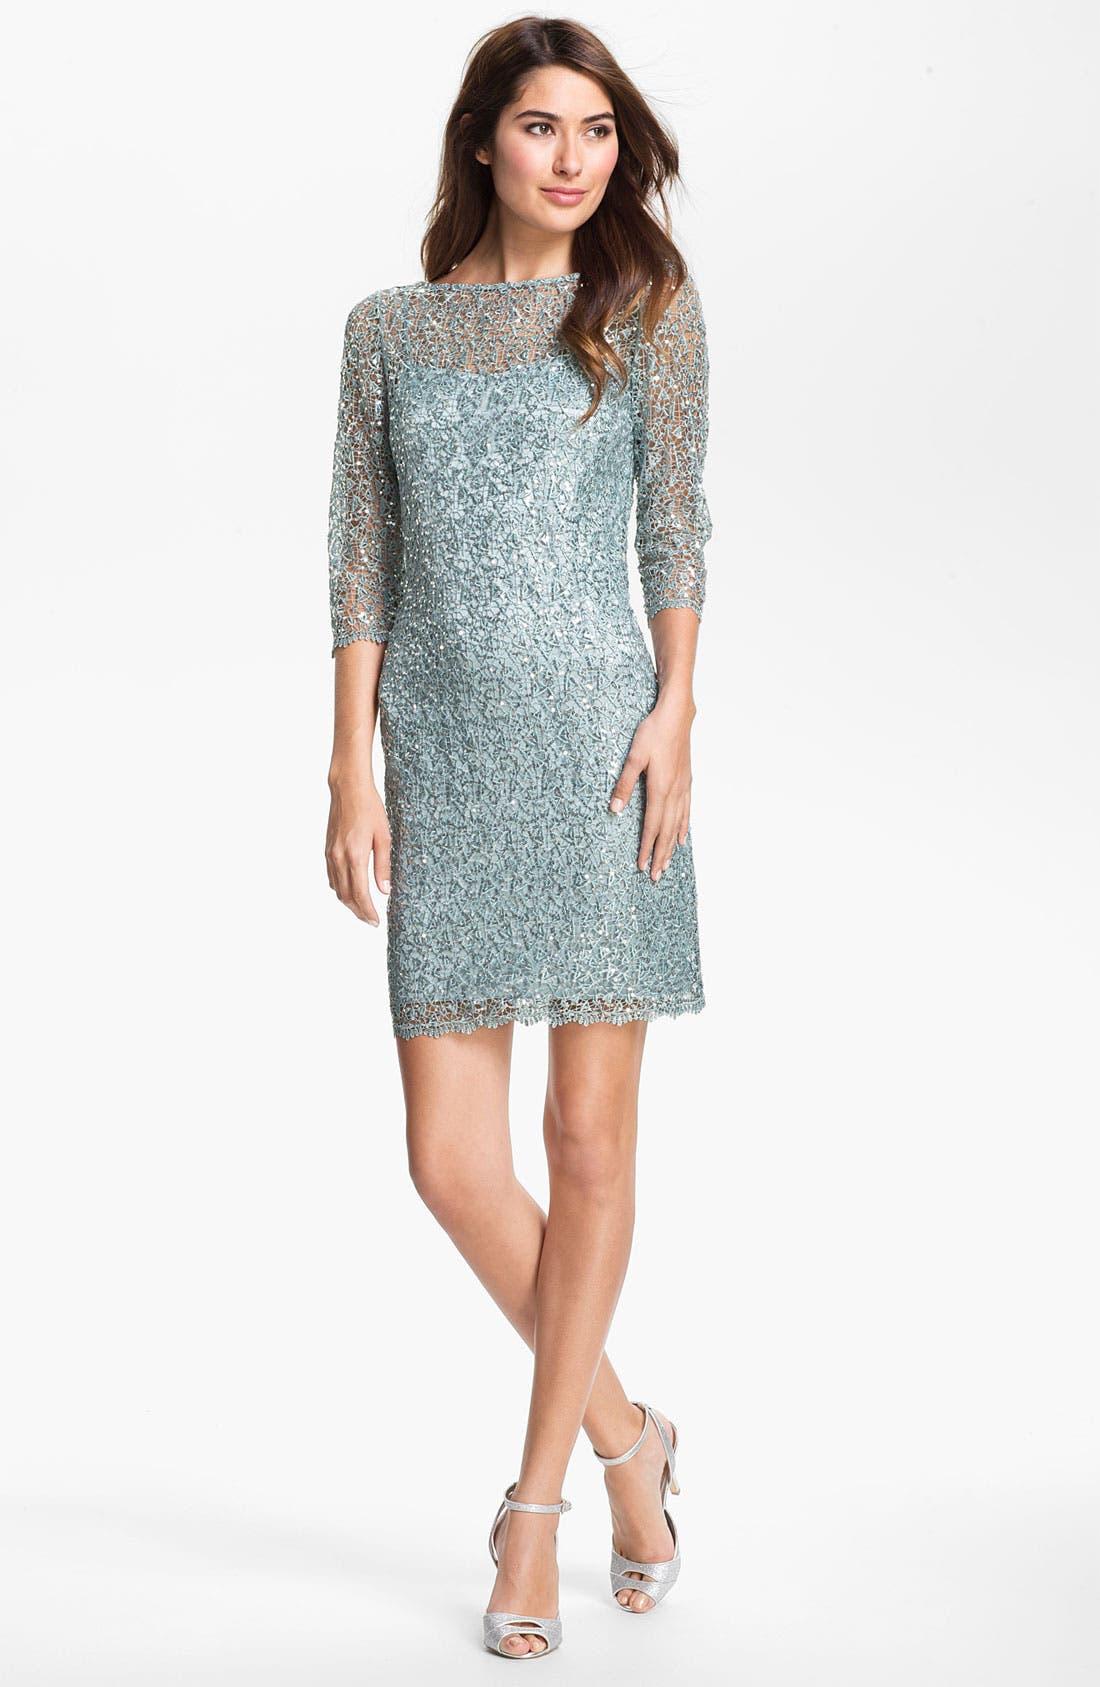 Alternate Image 1 Selected - Kay Unger Metallic Lace Sheath Dress